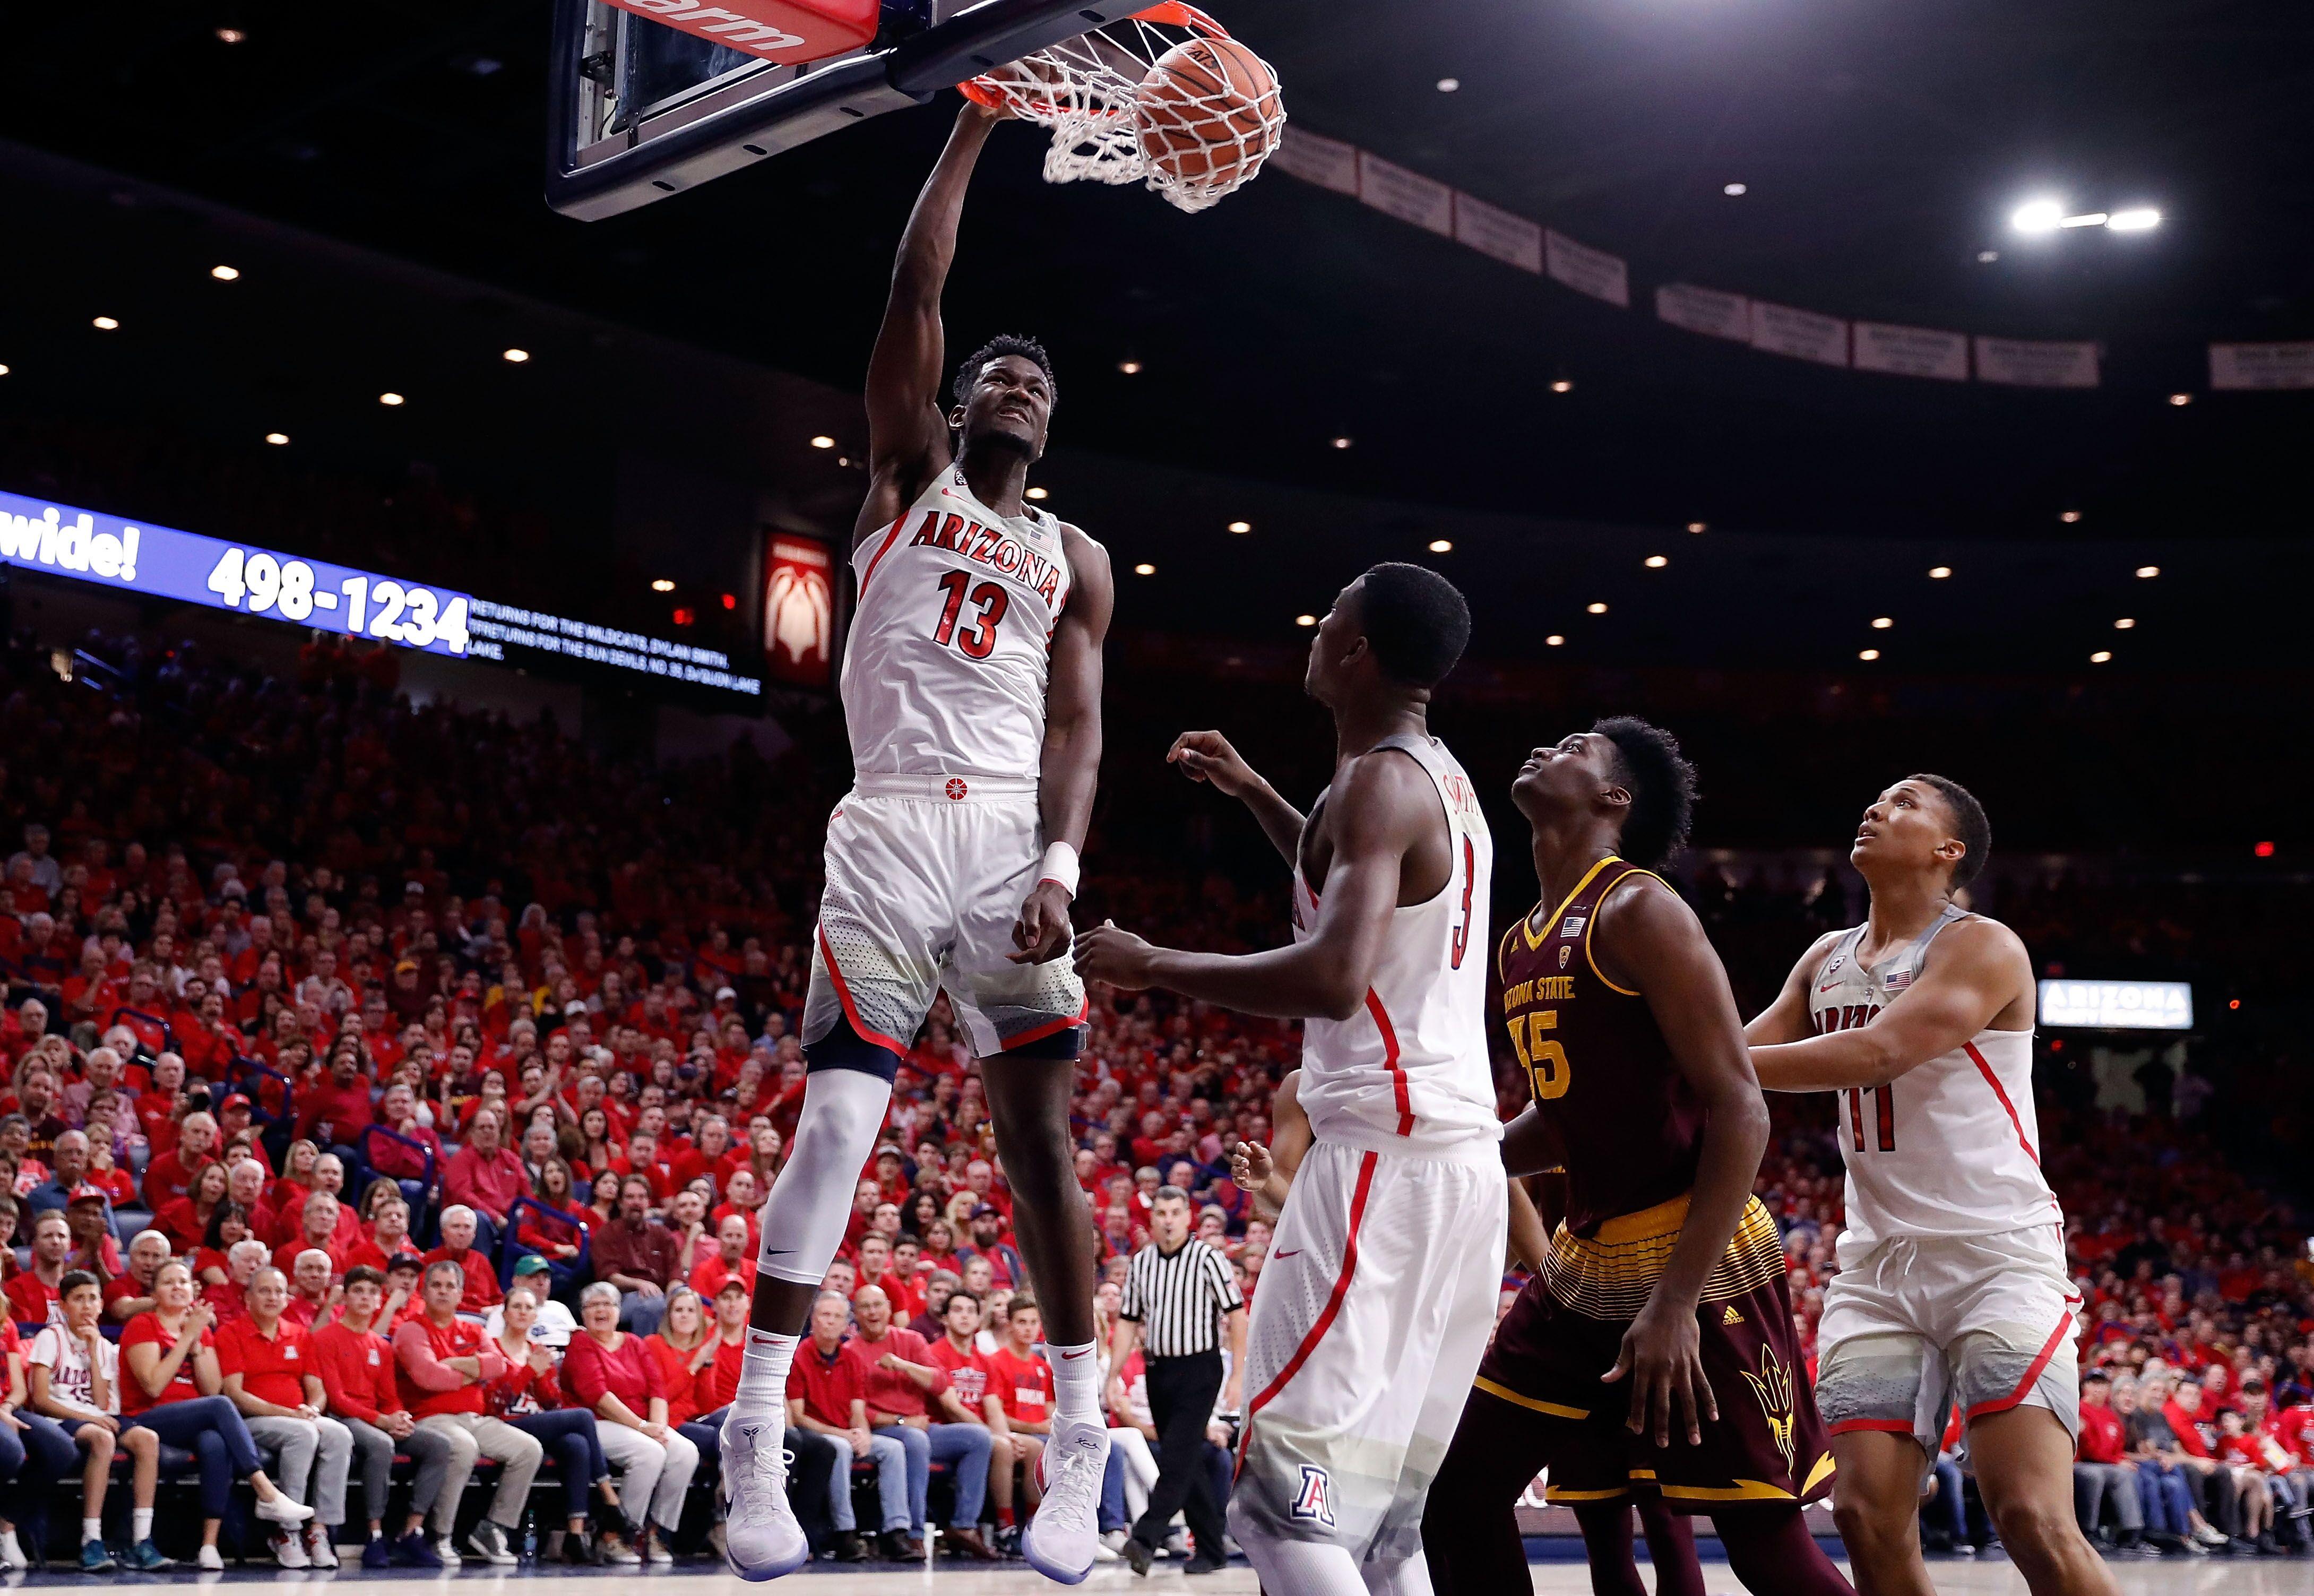 2018 NBA Prospect Report: Deandre Ayton